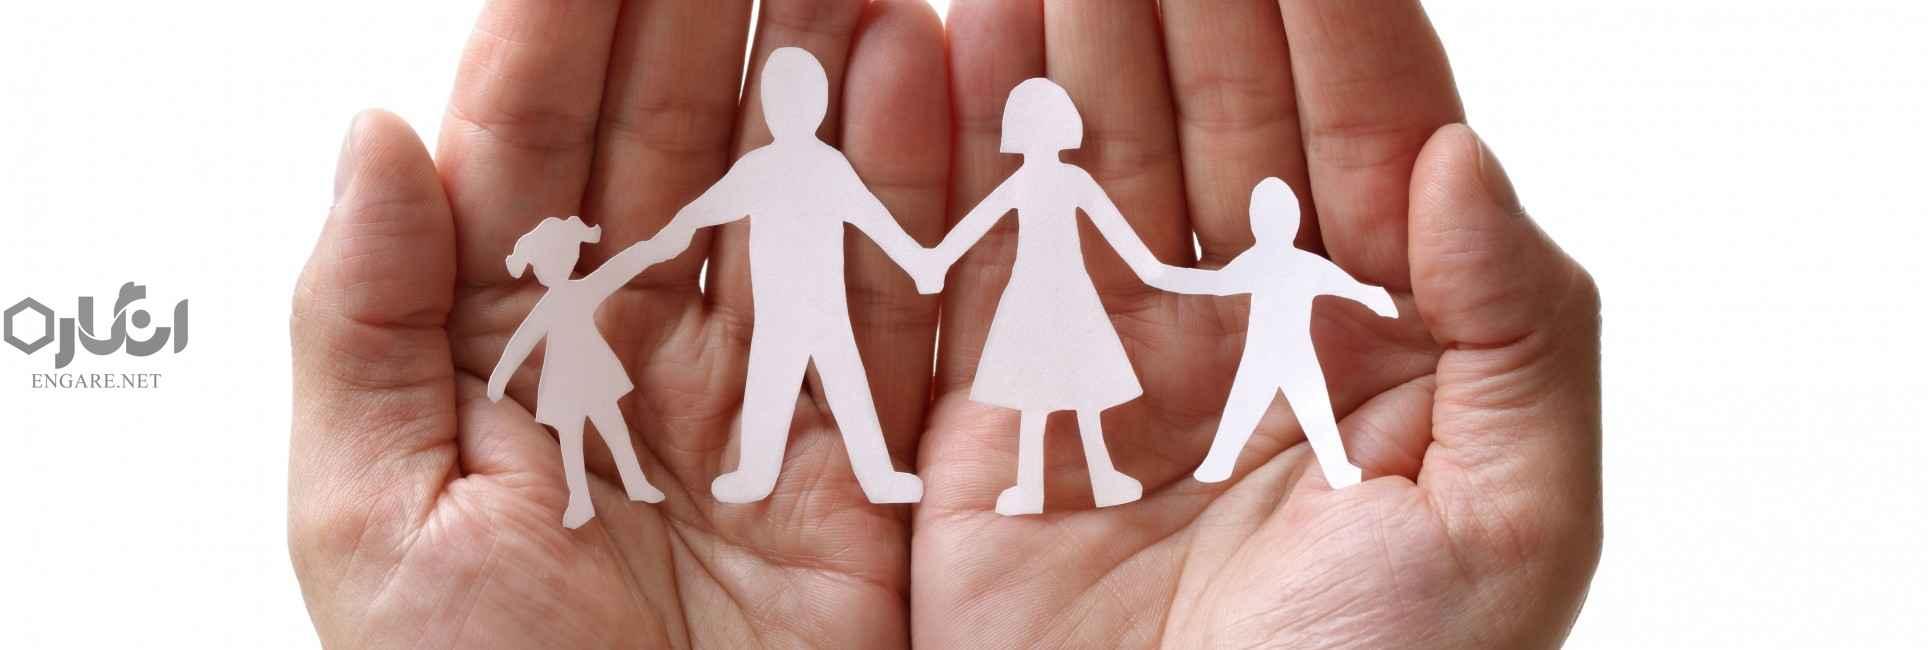 Hands with Paper Doll Family - سیاست اجتماعی چیست؟ - مهدیس کامکار, مفهوم سیاست گذاری اجتماعی, سیاستهای اجتماعی و رفاه اجتماعی, سیاستگذاری, سیاست گذاری اجتماعی چیست, سیاست گذاری اجتماعی, سیاست اجتماعی در ایران, سیاست اجتماعی چیست؟, سیاست اجتماعی, رفاه اجتماعی, رفاه, خدمات اجتماعی, تأمین اجتماعی, بهزیستی, اقتصاد آزاد, Social Policy & Protection